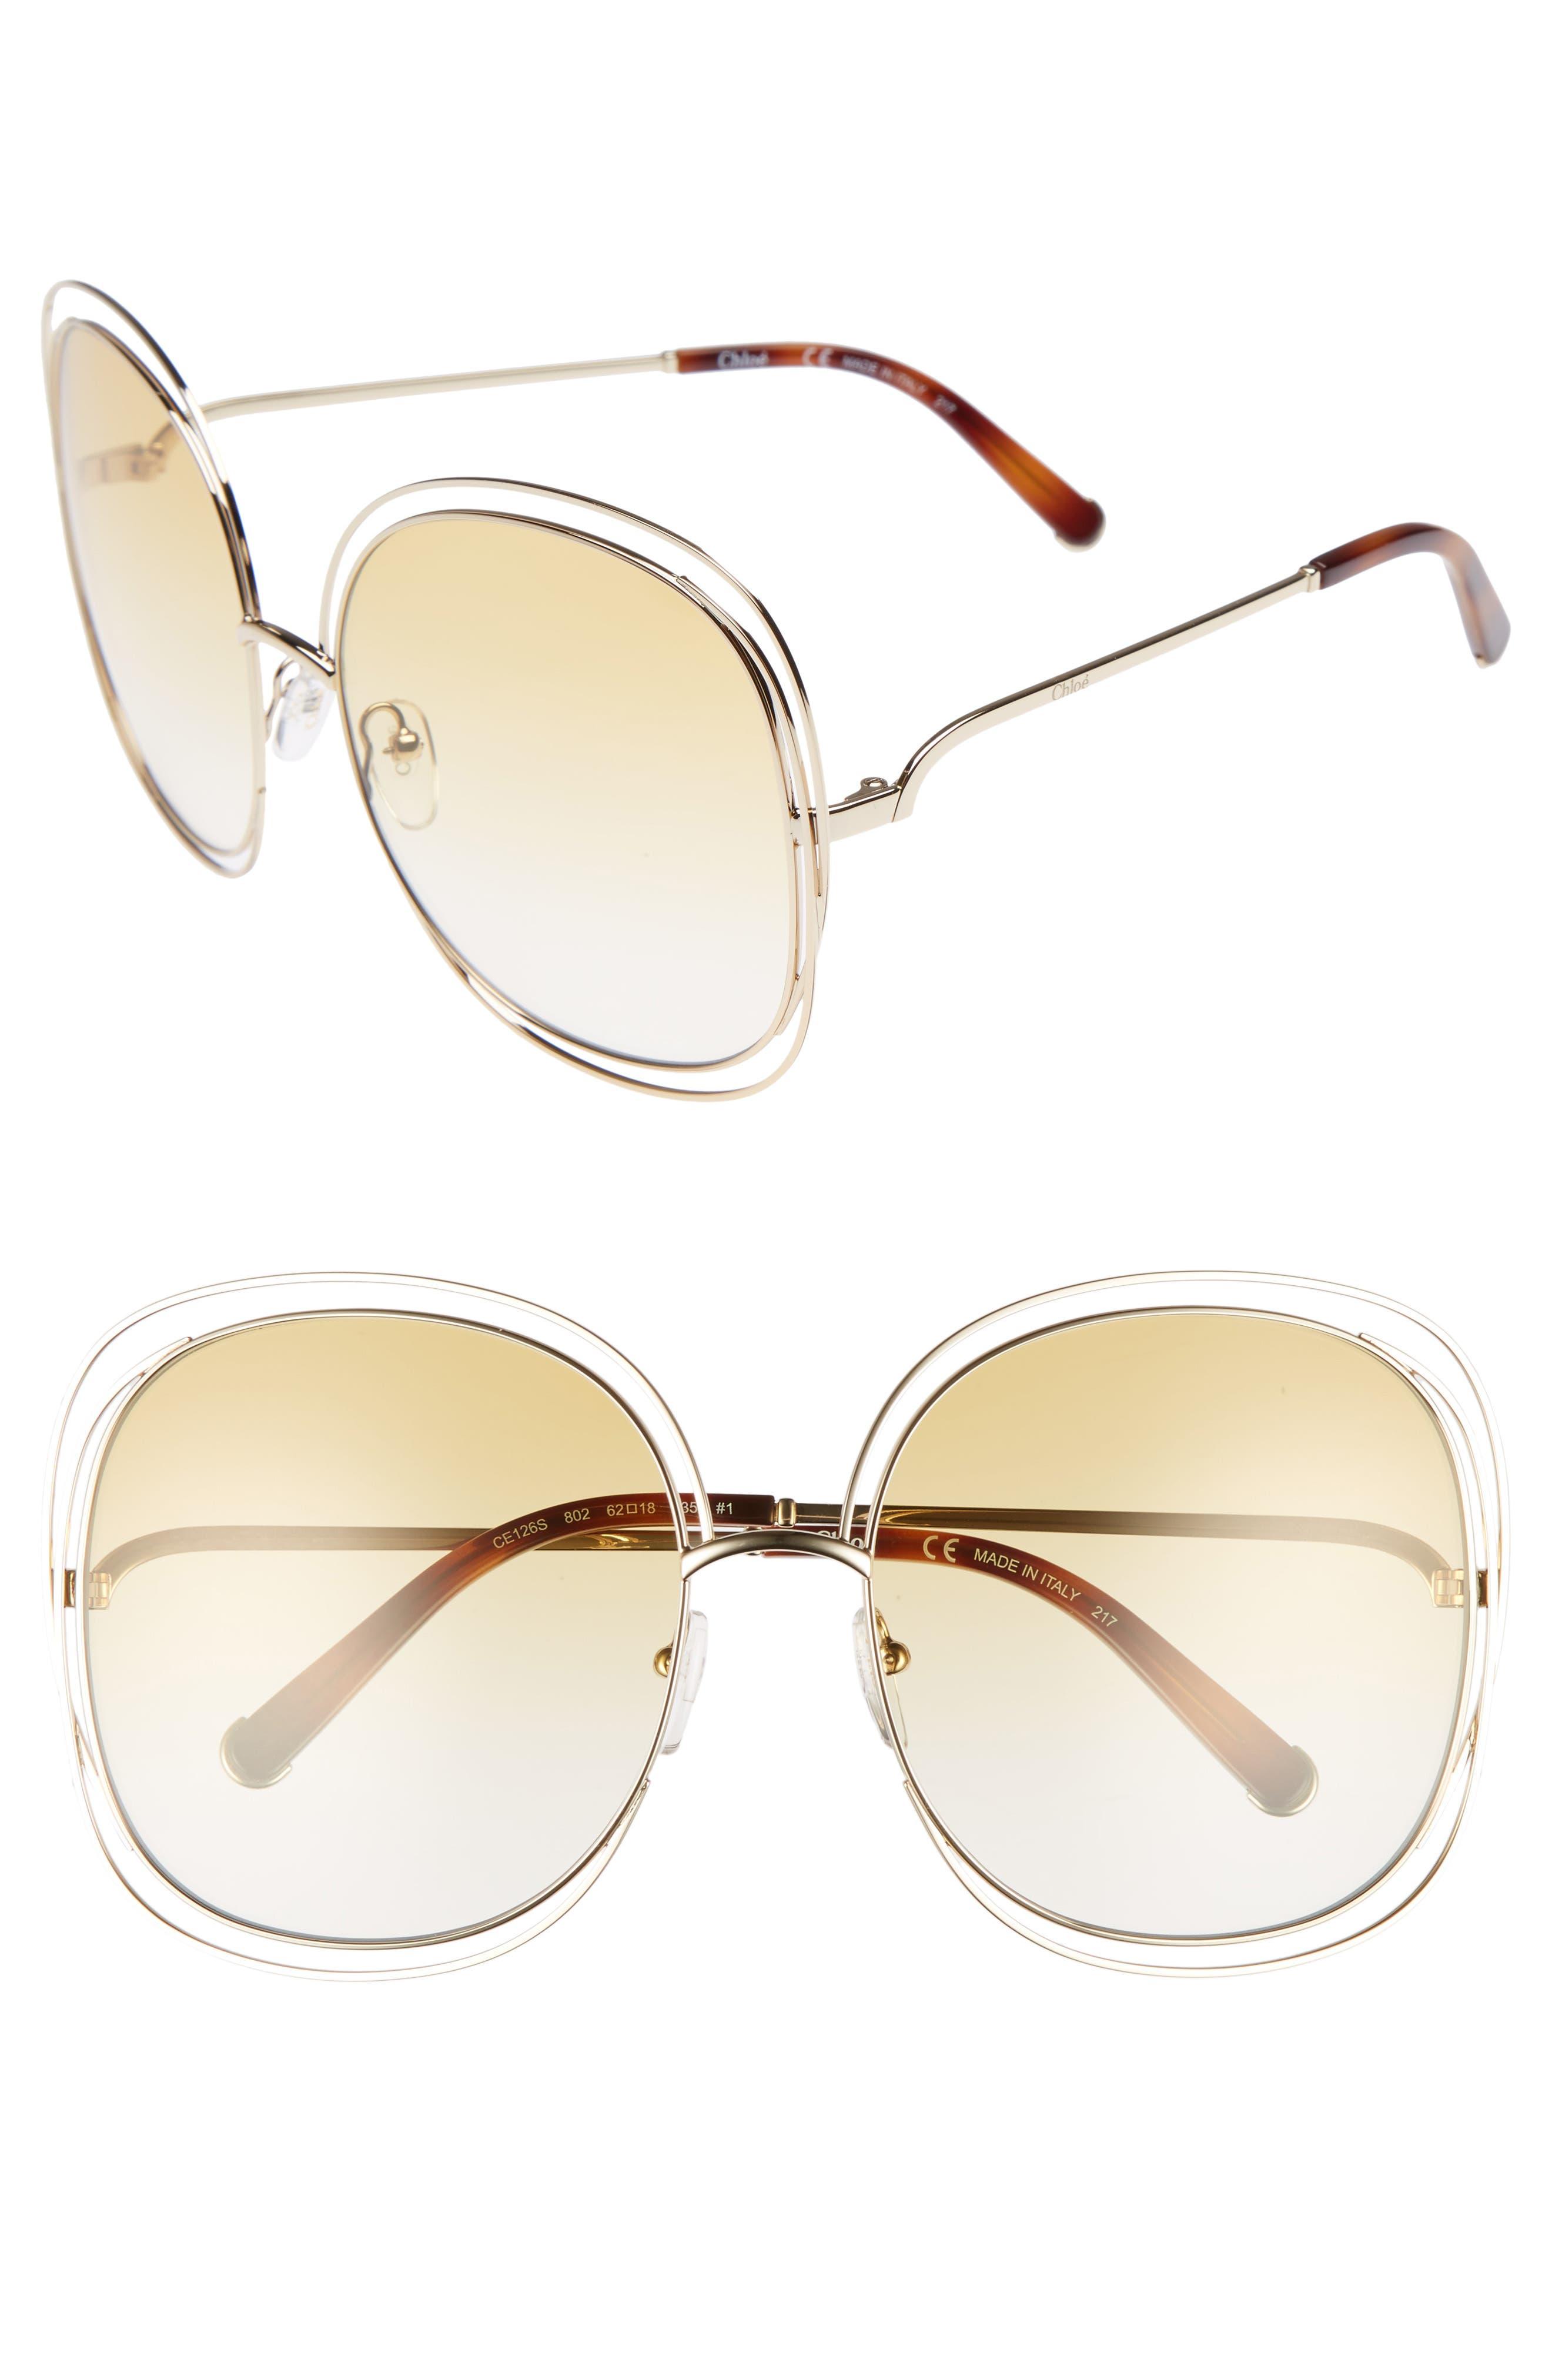 Carlina 62mm Oversize Sunglasses,                             Main thumbnail 1, color,                             714